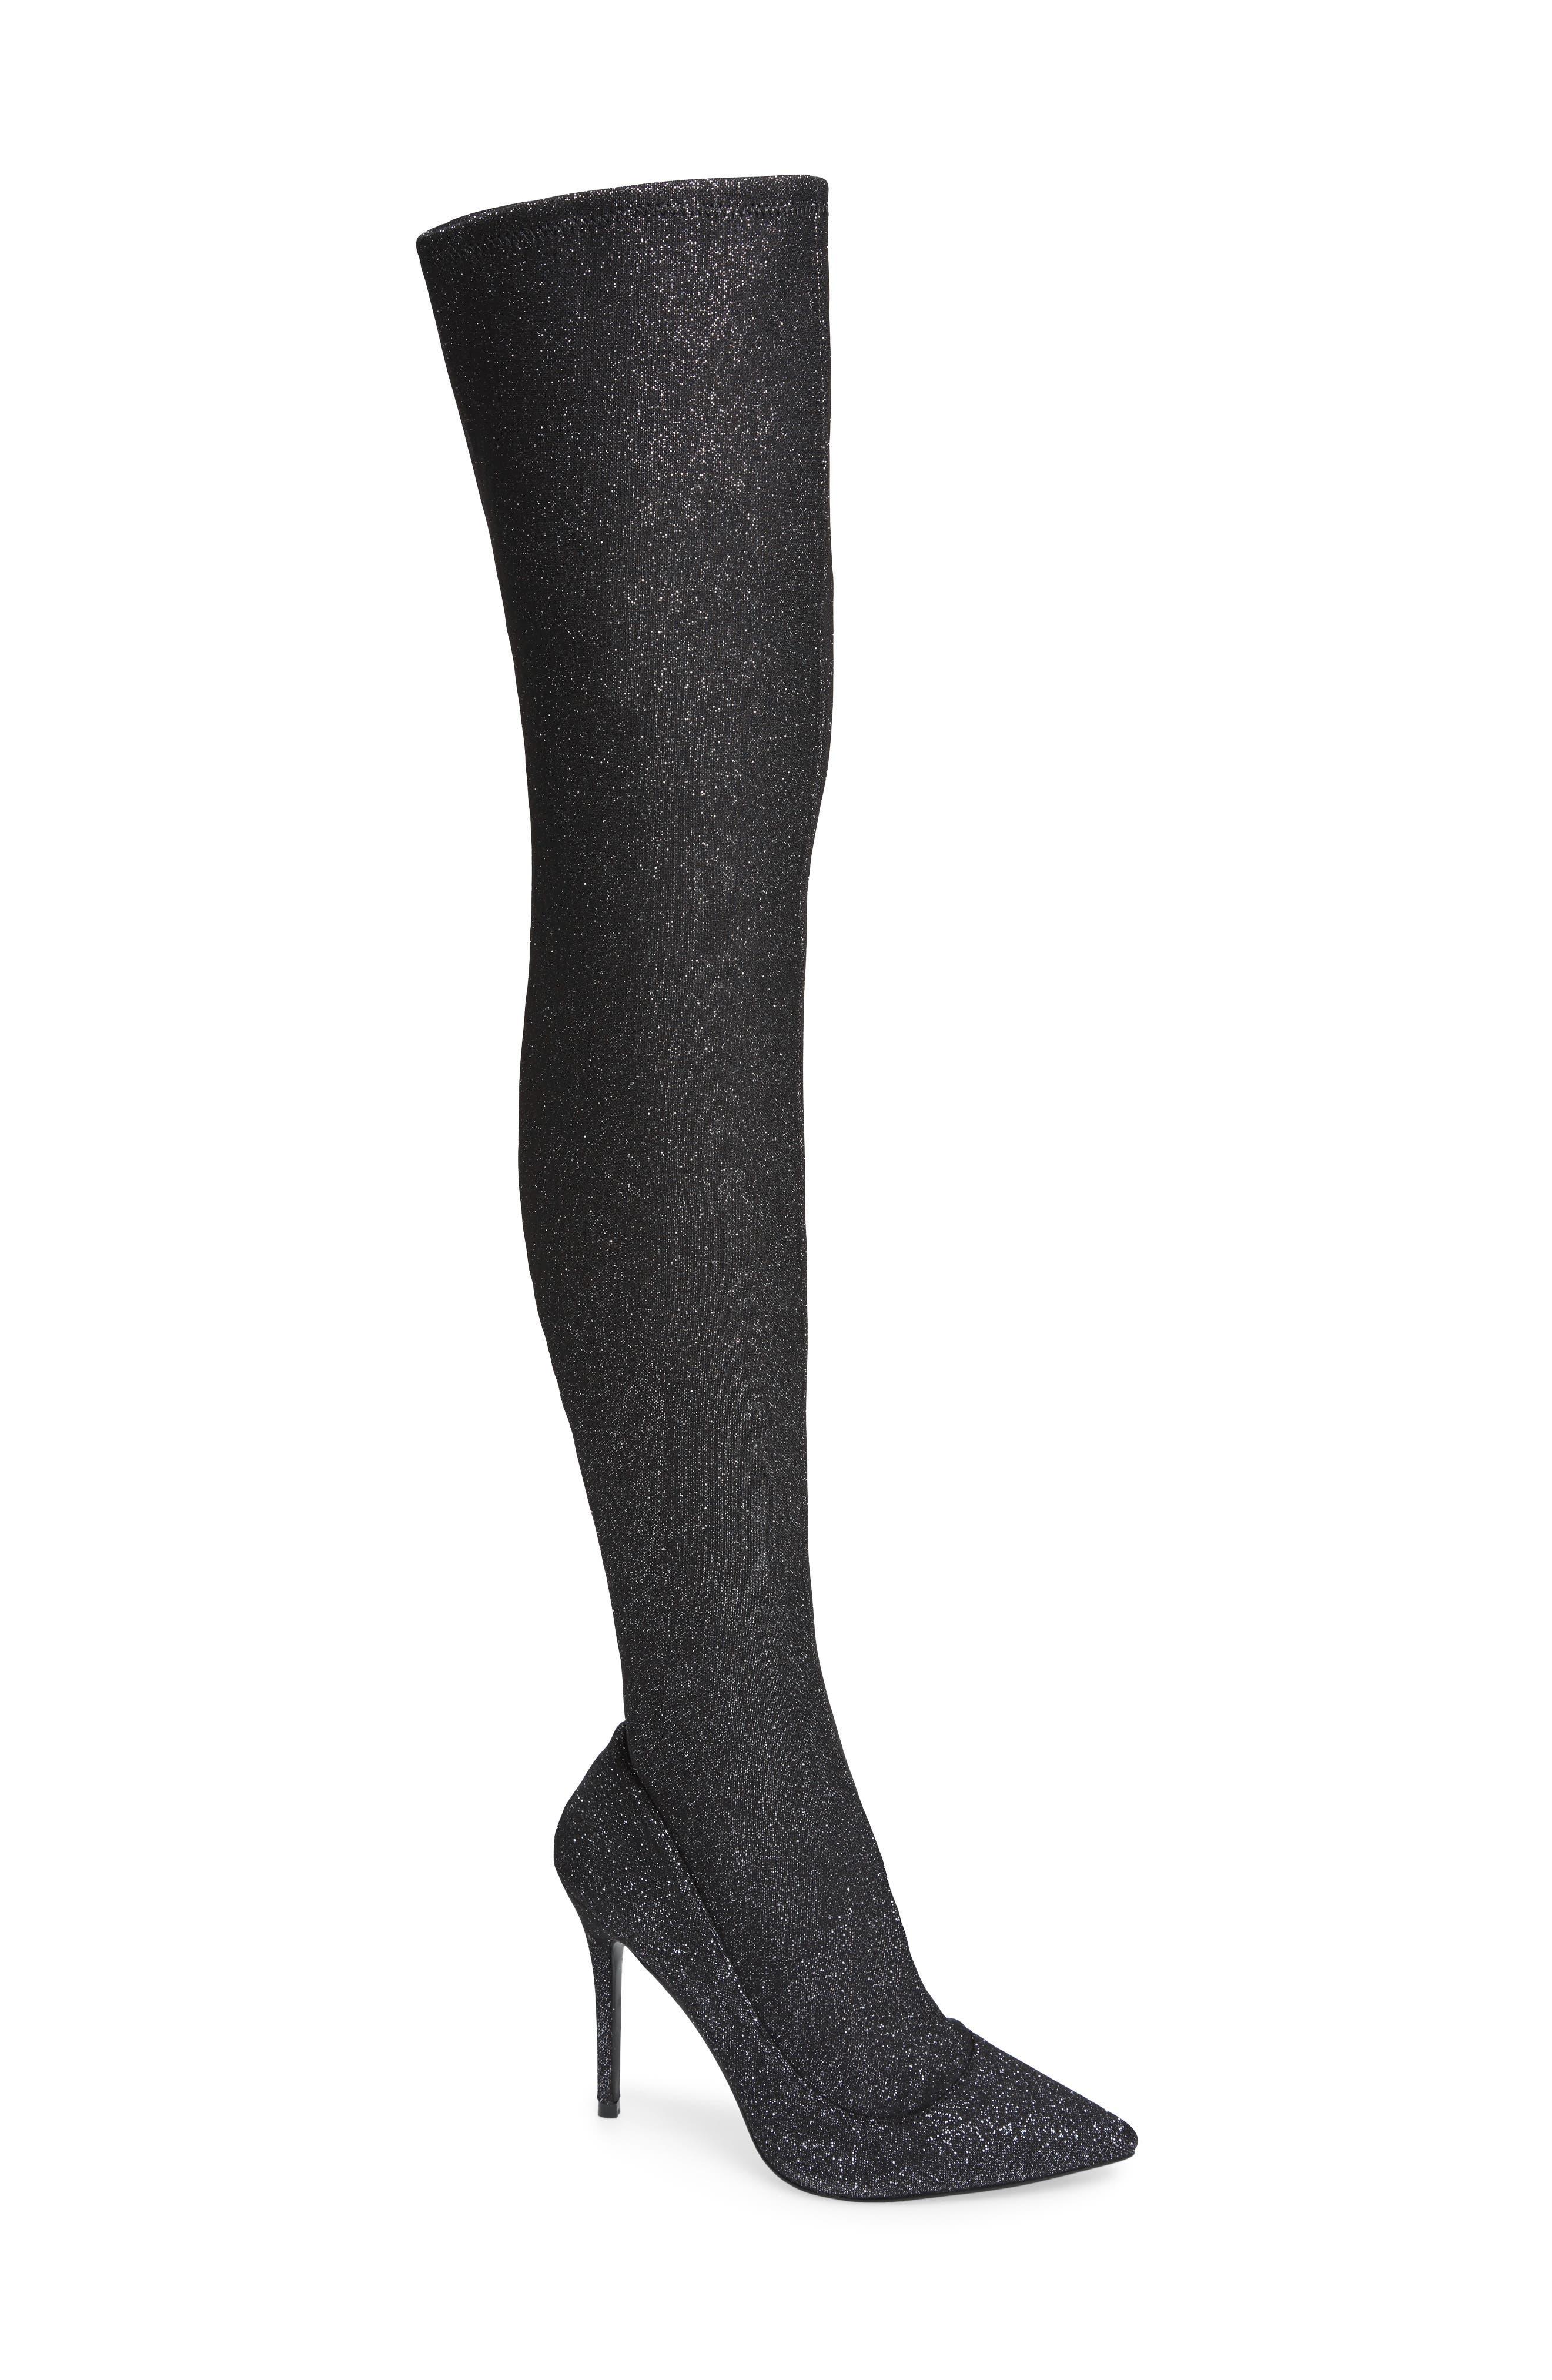 Main Image - Topshop Bellini Stiletto Over the Knee Boot (Women)